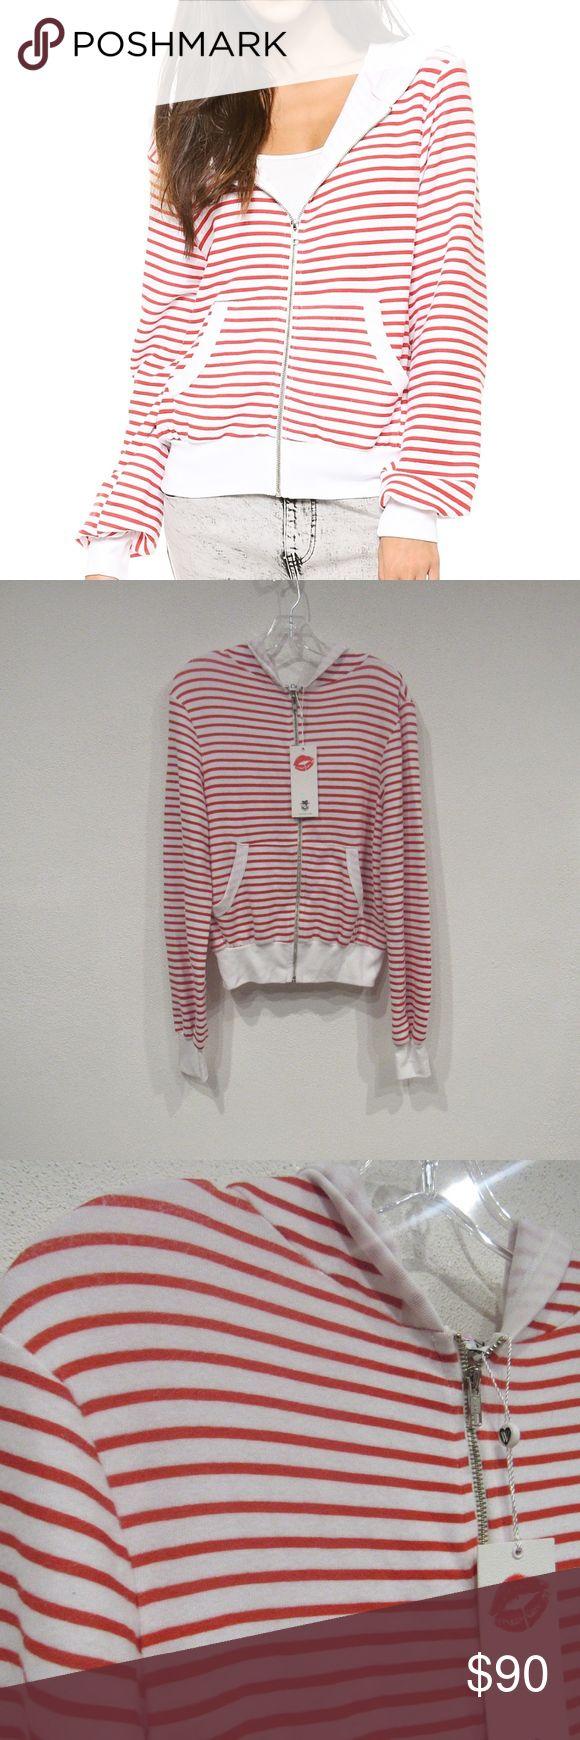 Wildfox Malibu Stripe Zip Up Hoodie New with tags. Fabric: Jersey. 47% rayon/47% polyester/6% spandex. No trades. 1101 Wildfox Tops Sweatshirts & Hoodies